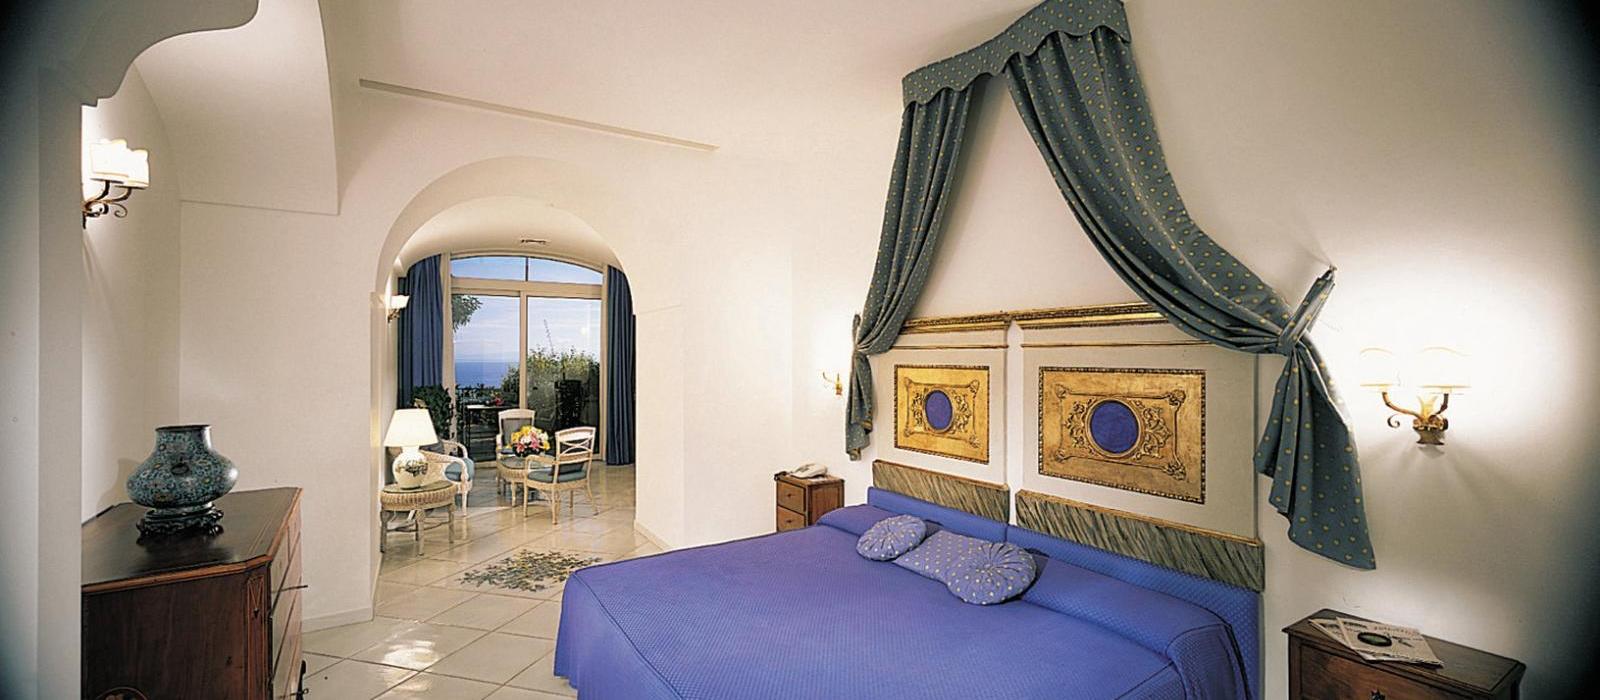 圣塔卡特林纳酒店(Hotel Santa Caterina) 图片  www.lhw.cn